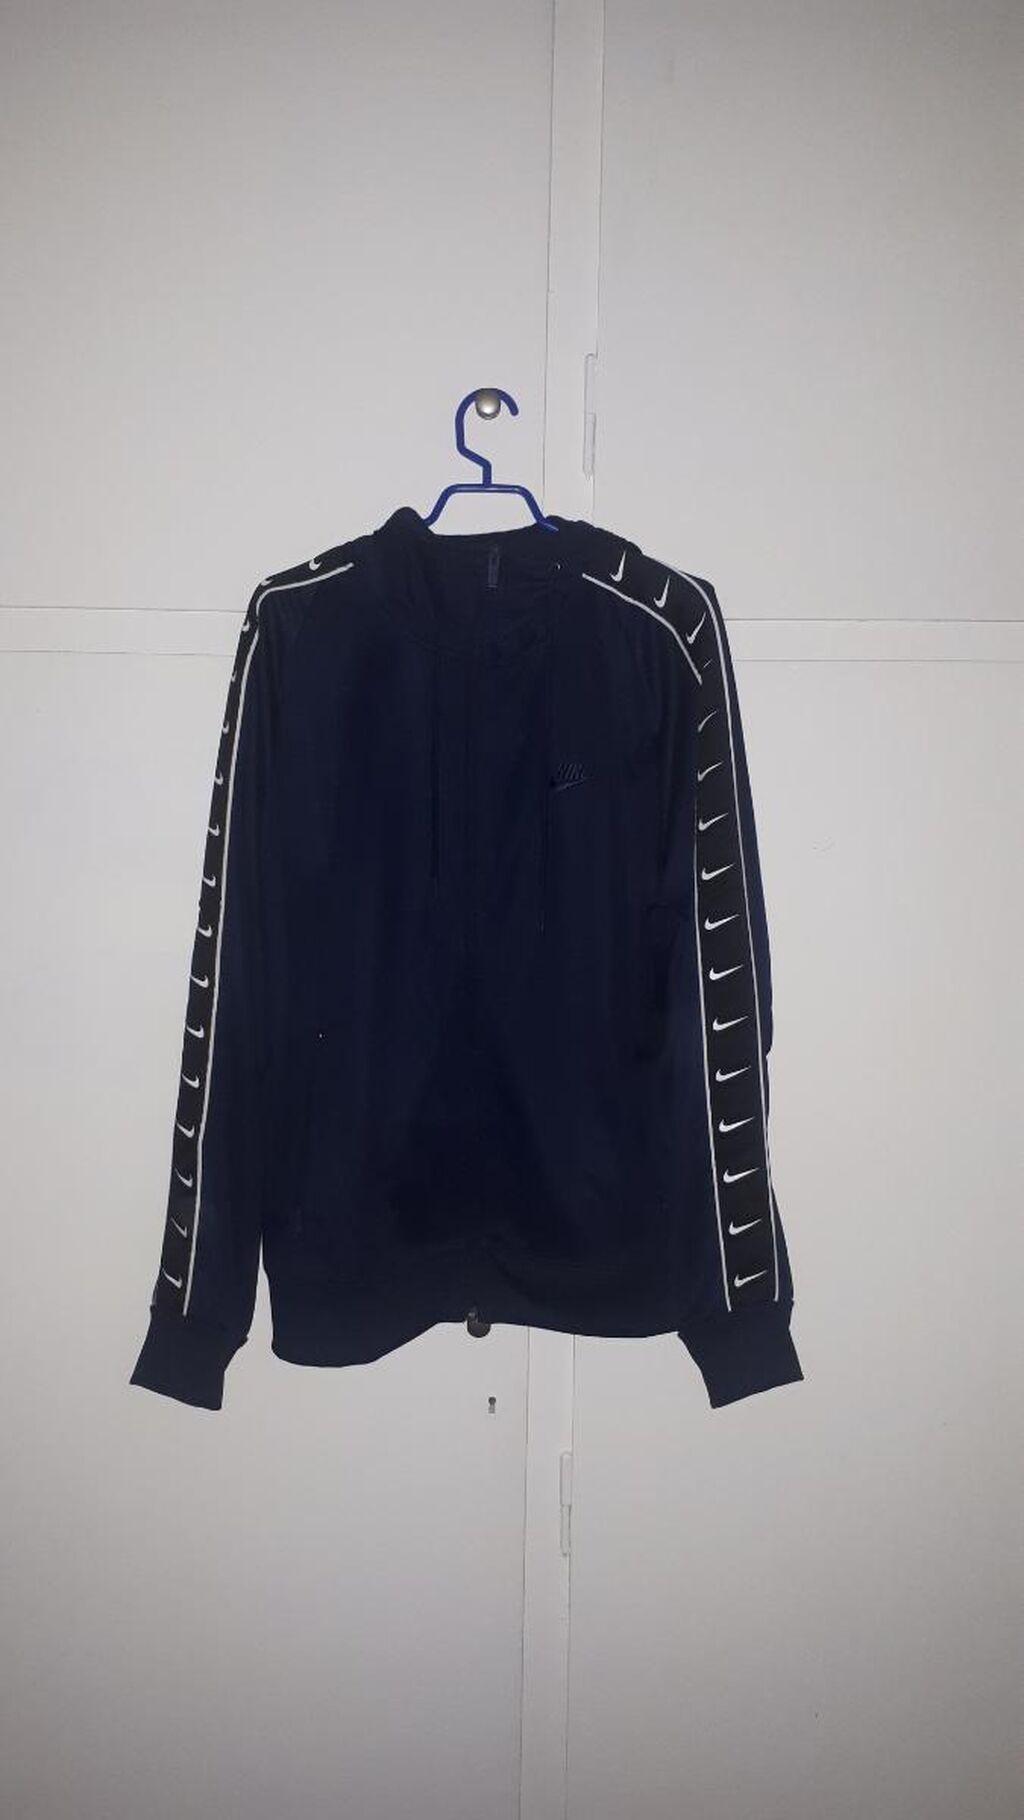 Nike tape full zip hoodie perfect condition(ελαχιστα φορεμένη)